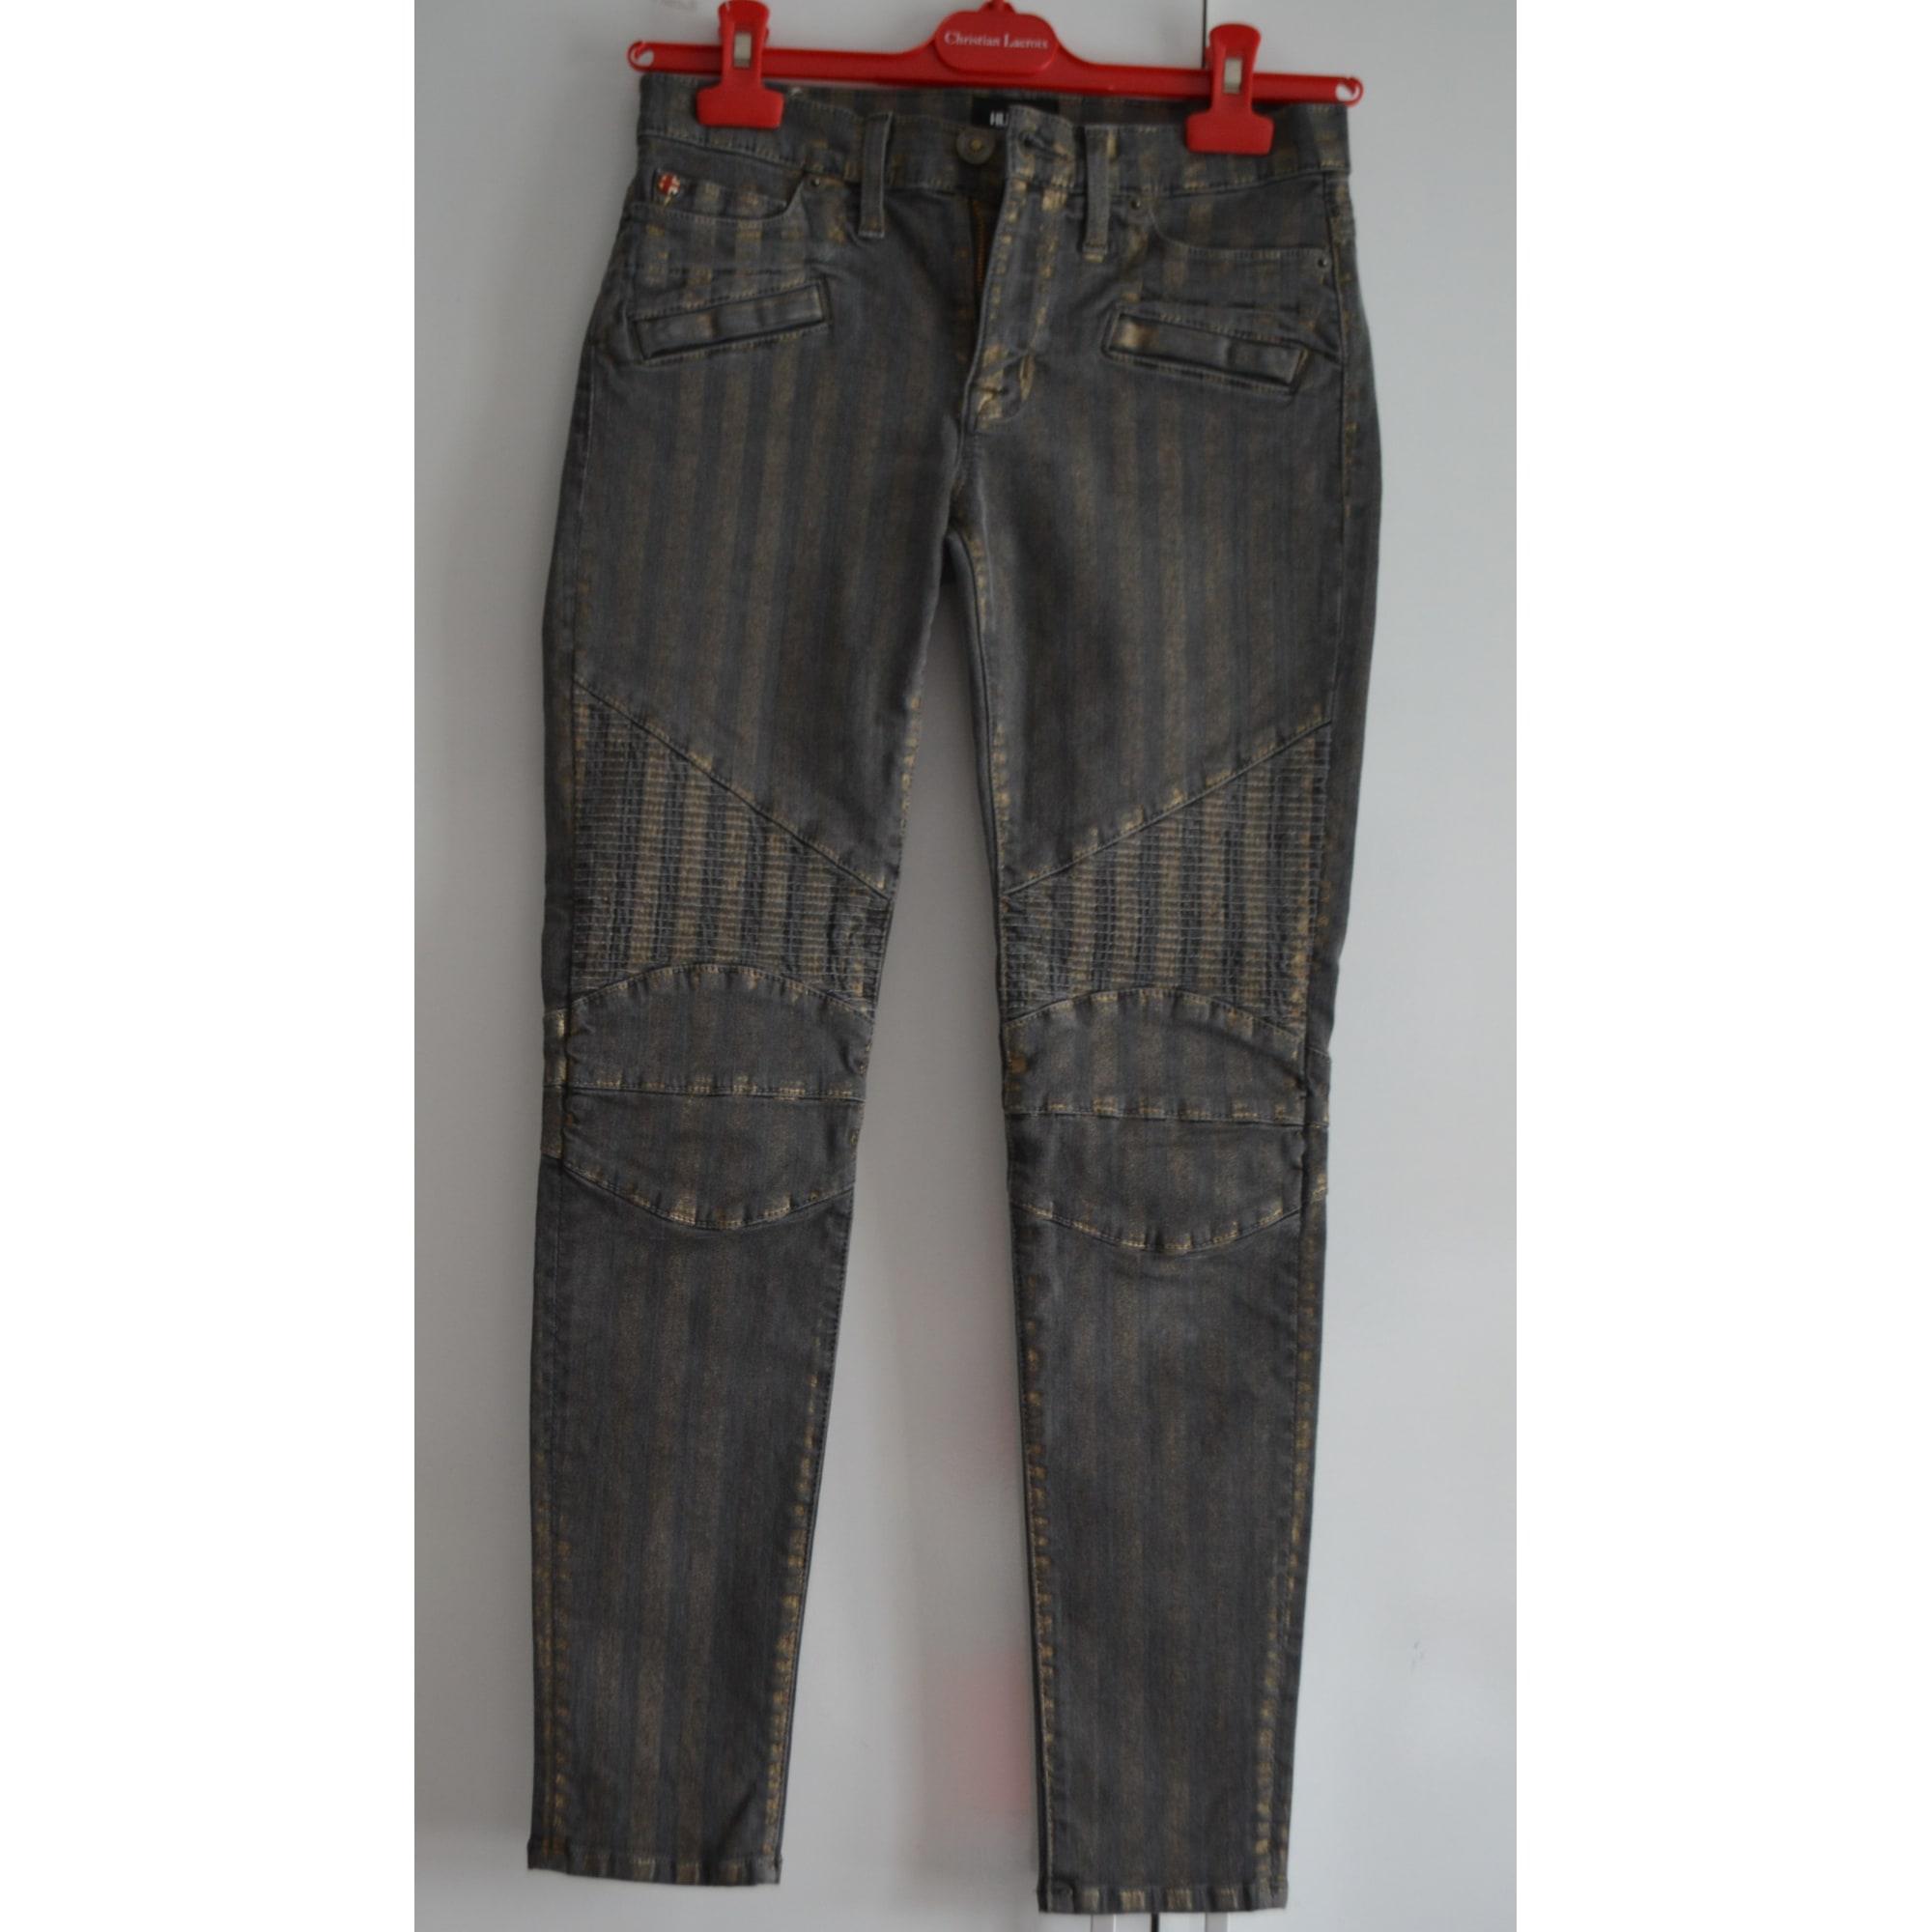 Jeans slim HUDSON JEANS Gris, anthracite